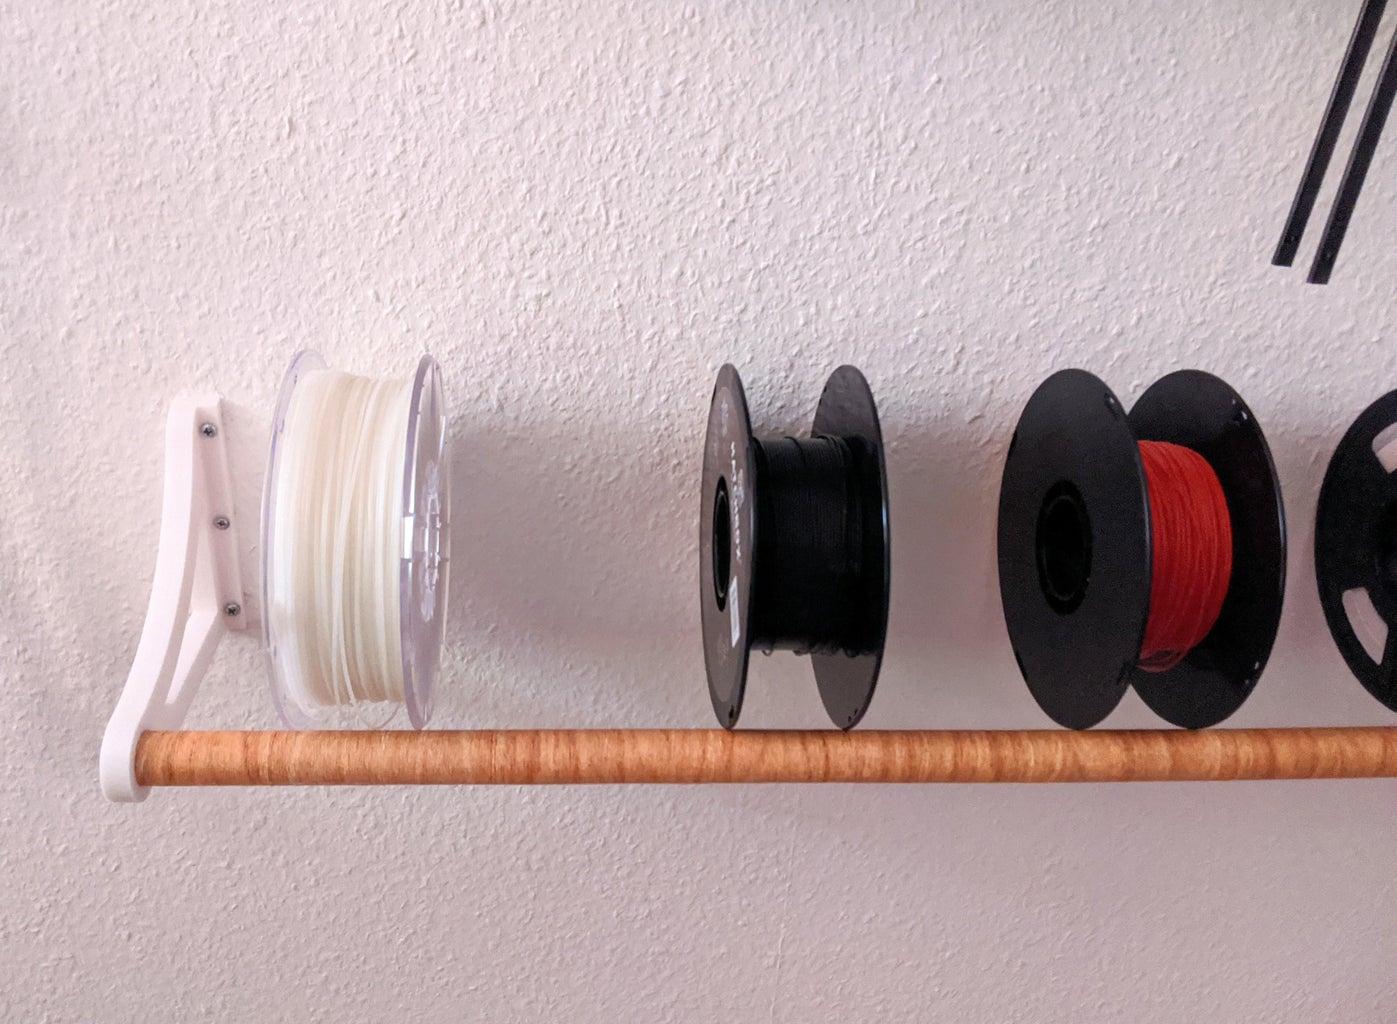 Add Spools to Rack